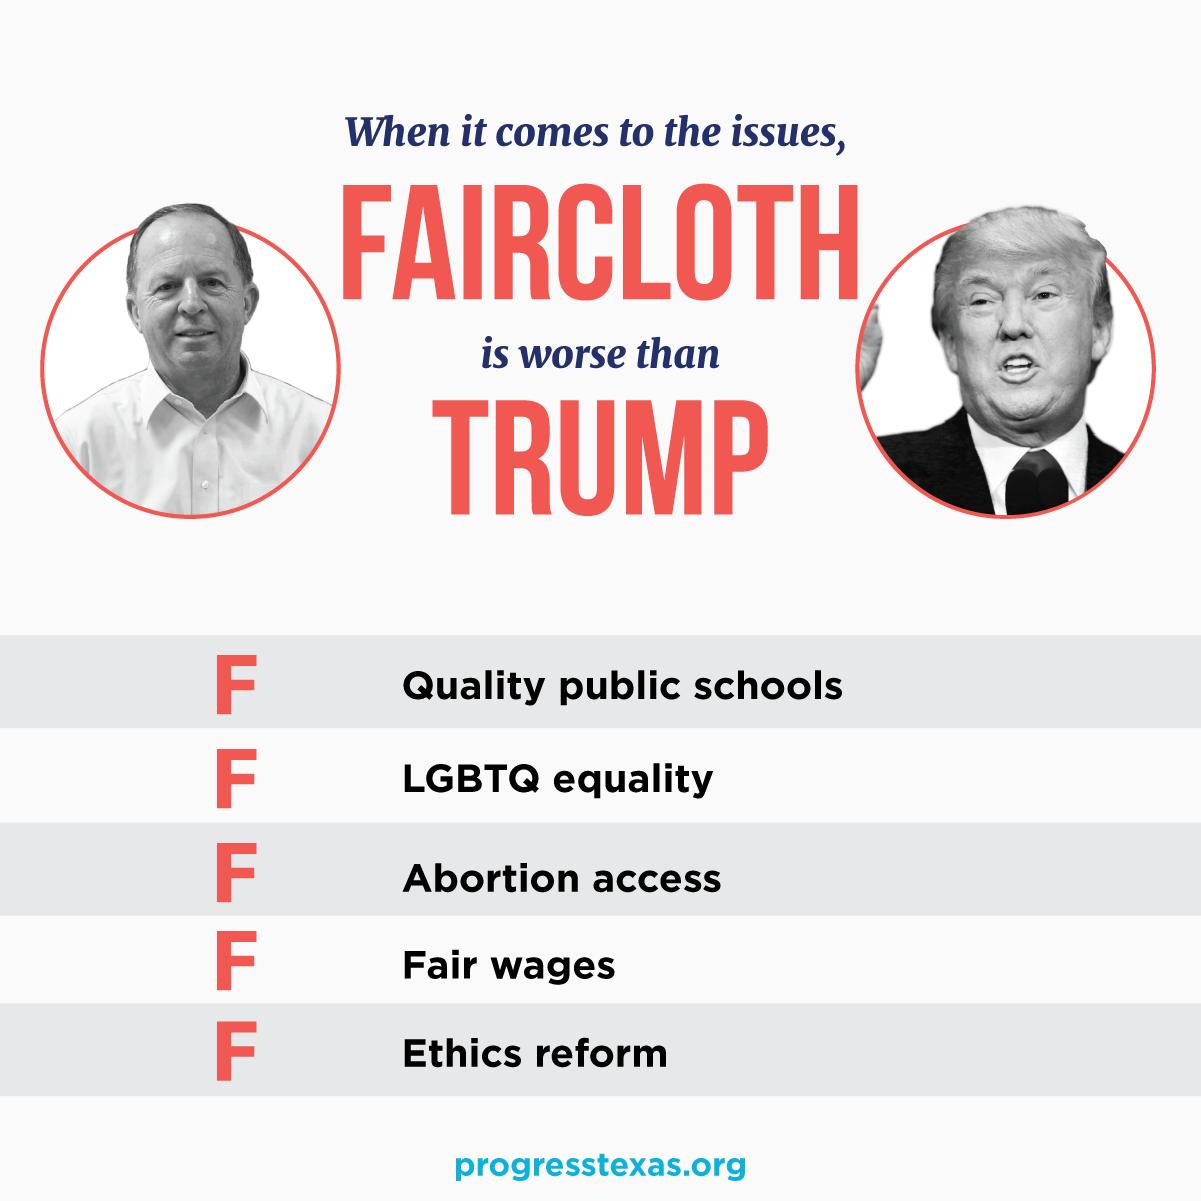 Wayne Faircloth report card